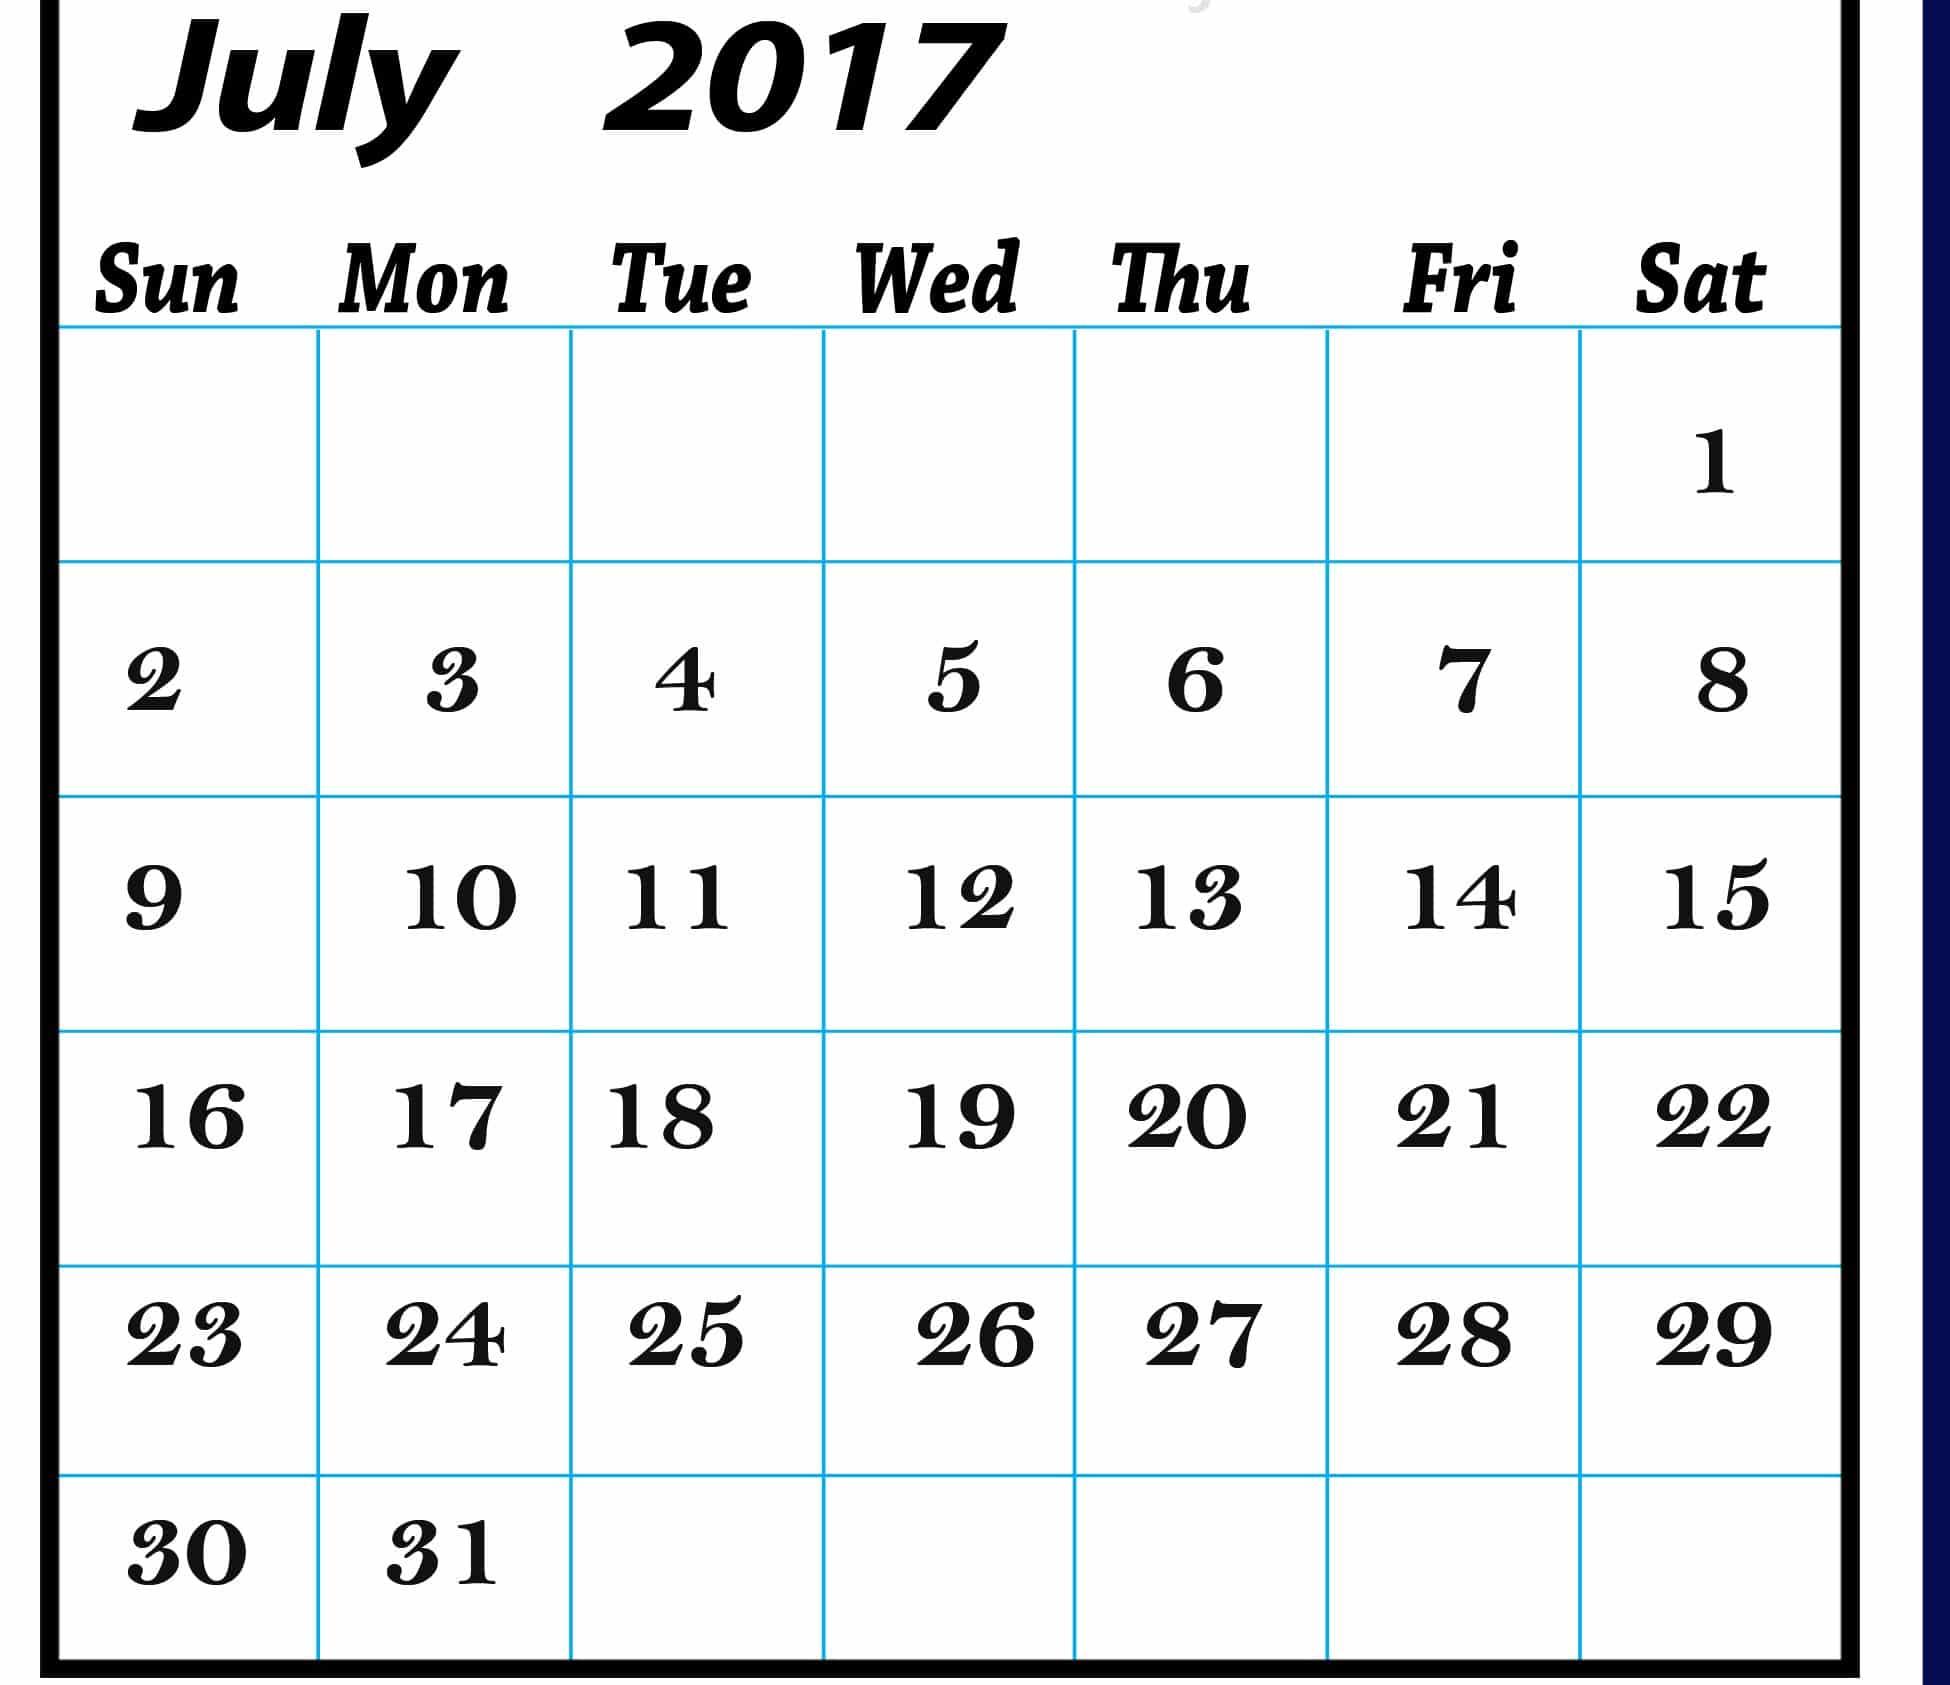 Monthly Calendar July 2017